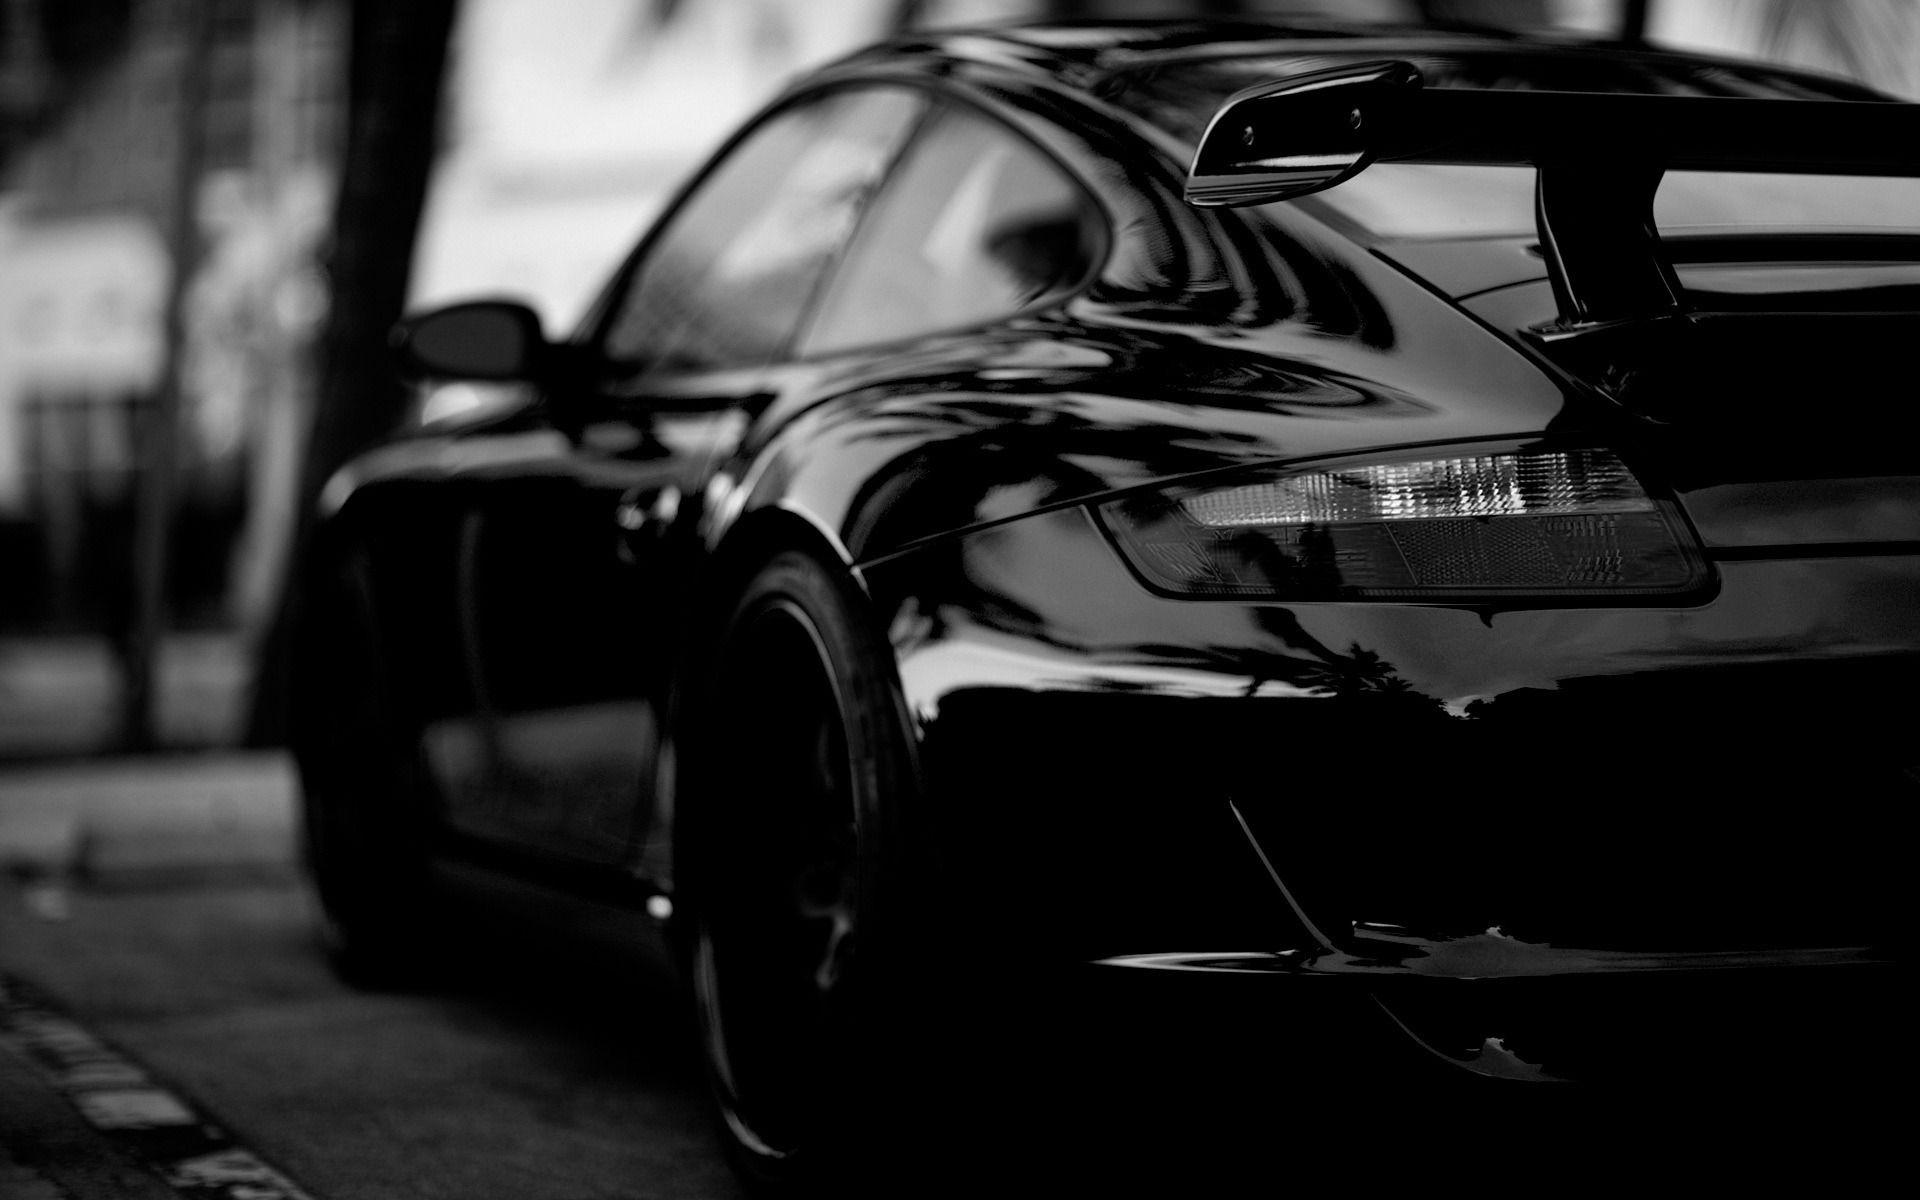 Okay, maybe black friday isn't completely dead. Black Car Wallpapers 4k Hd Black Car Backgrounds On Wallpaperbat